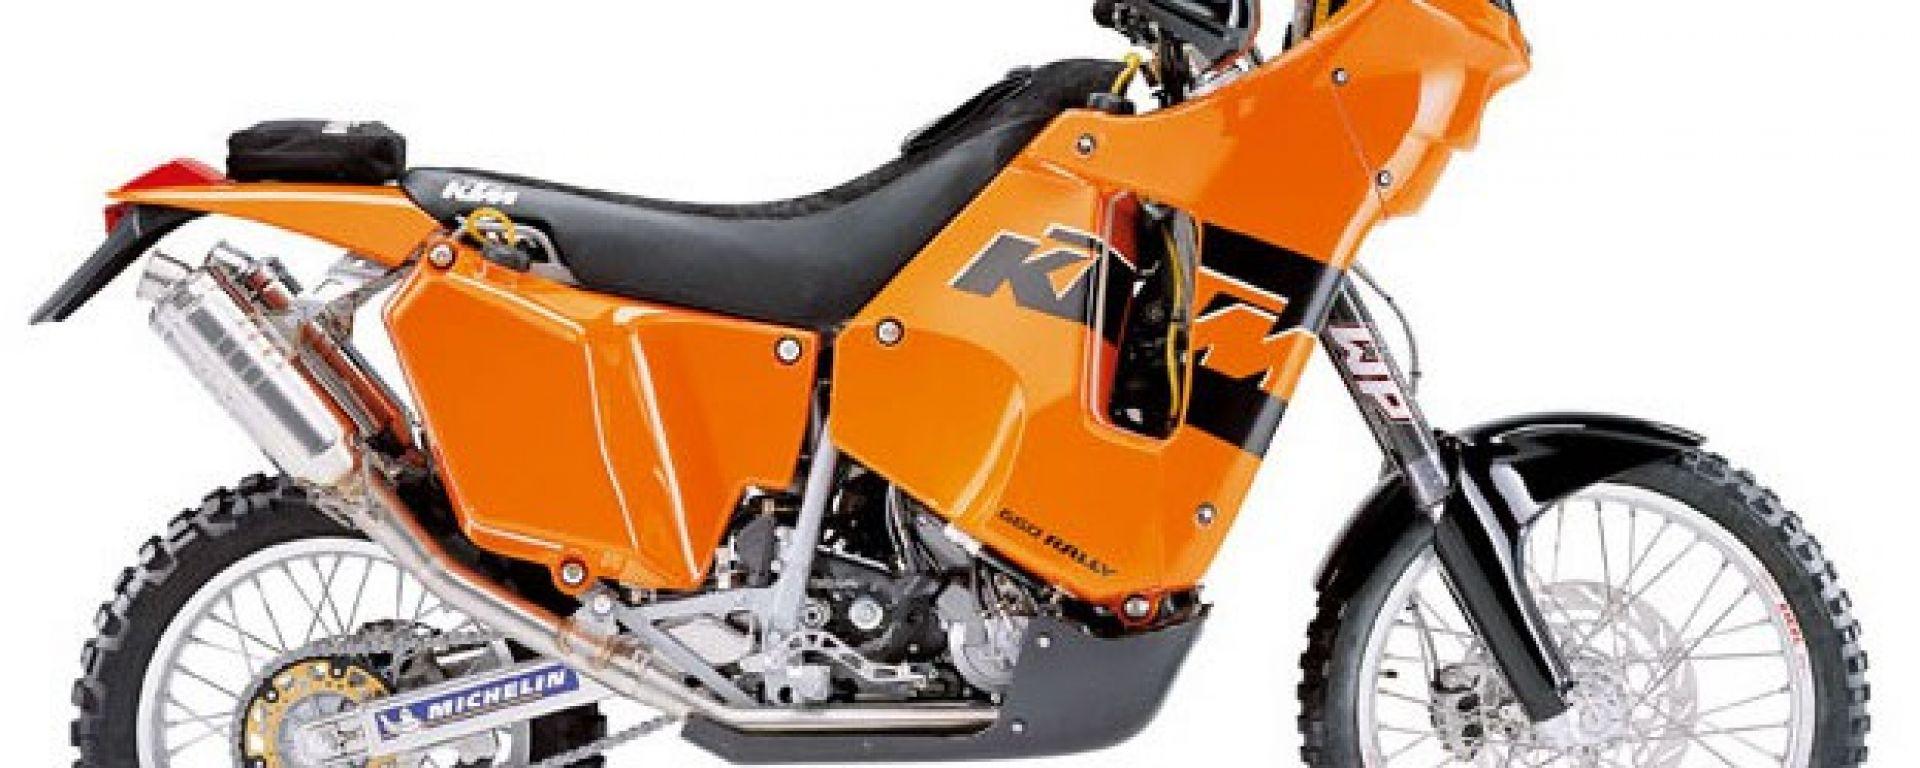 KTM LC4 Adventure R